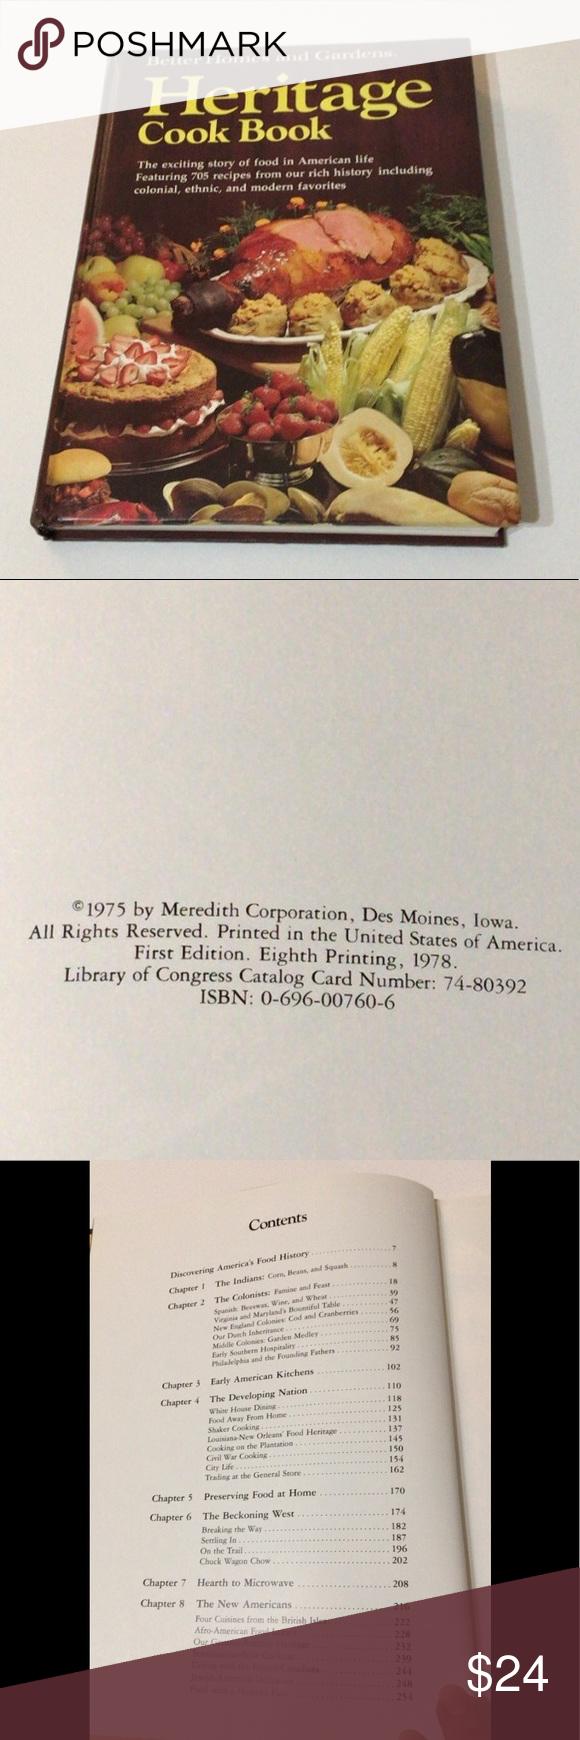 e99059f89a0a1dedfa2f337354277c3d - Better Homes And Gardens Cookbook 1975